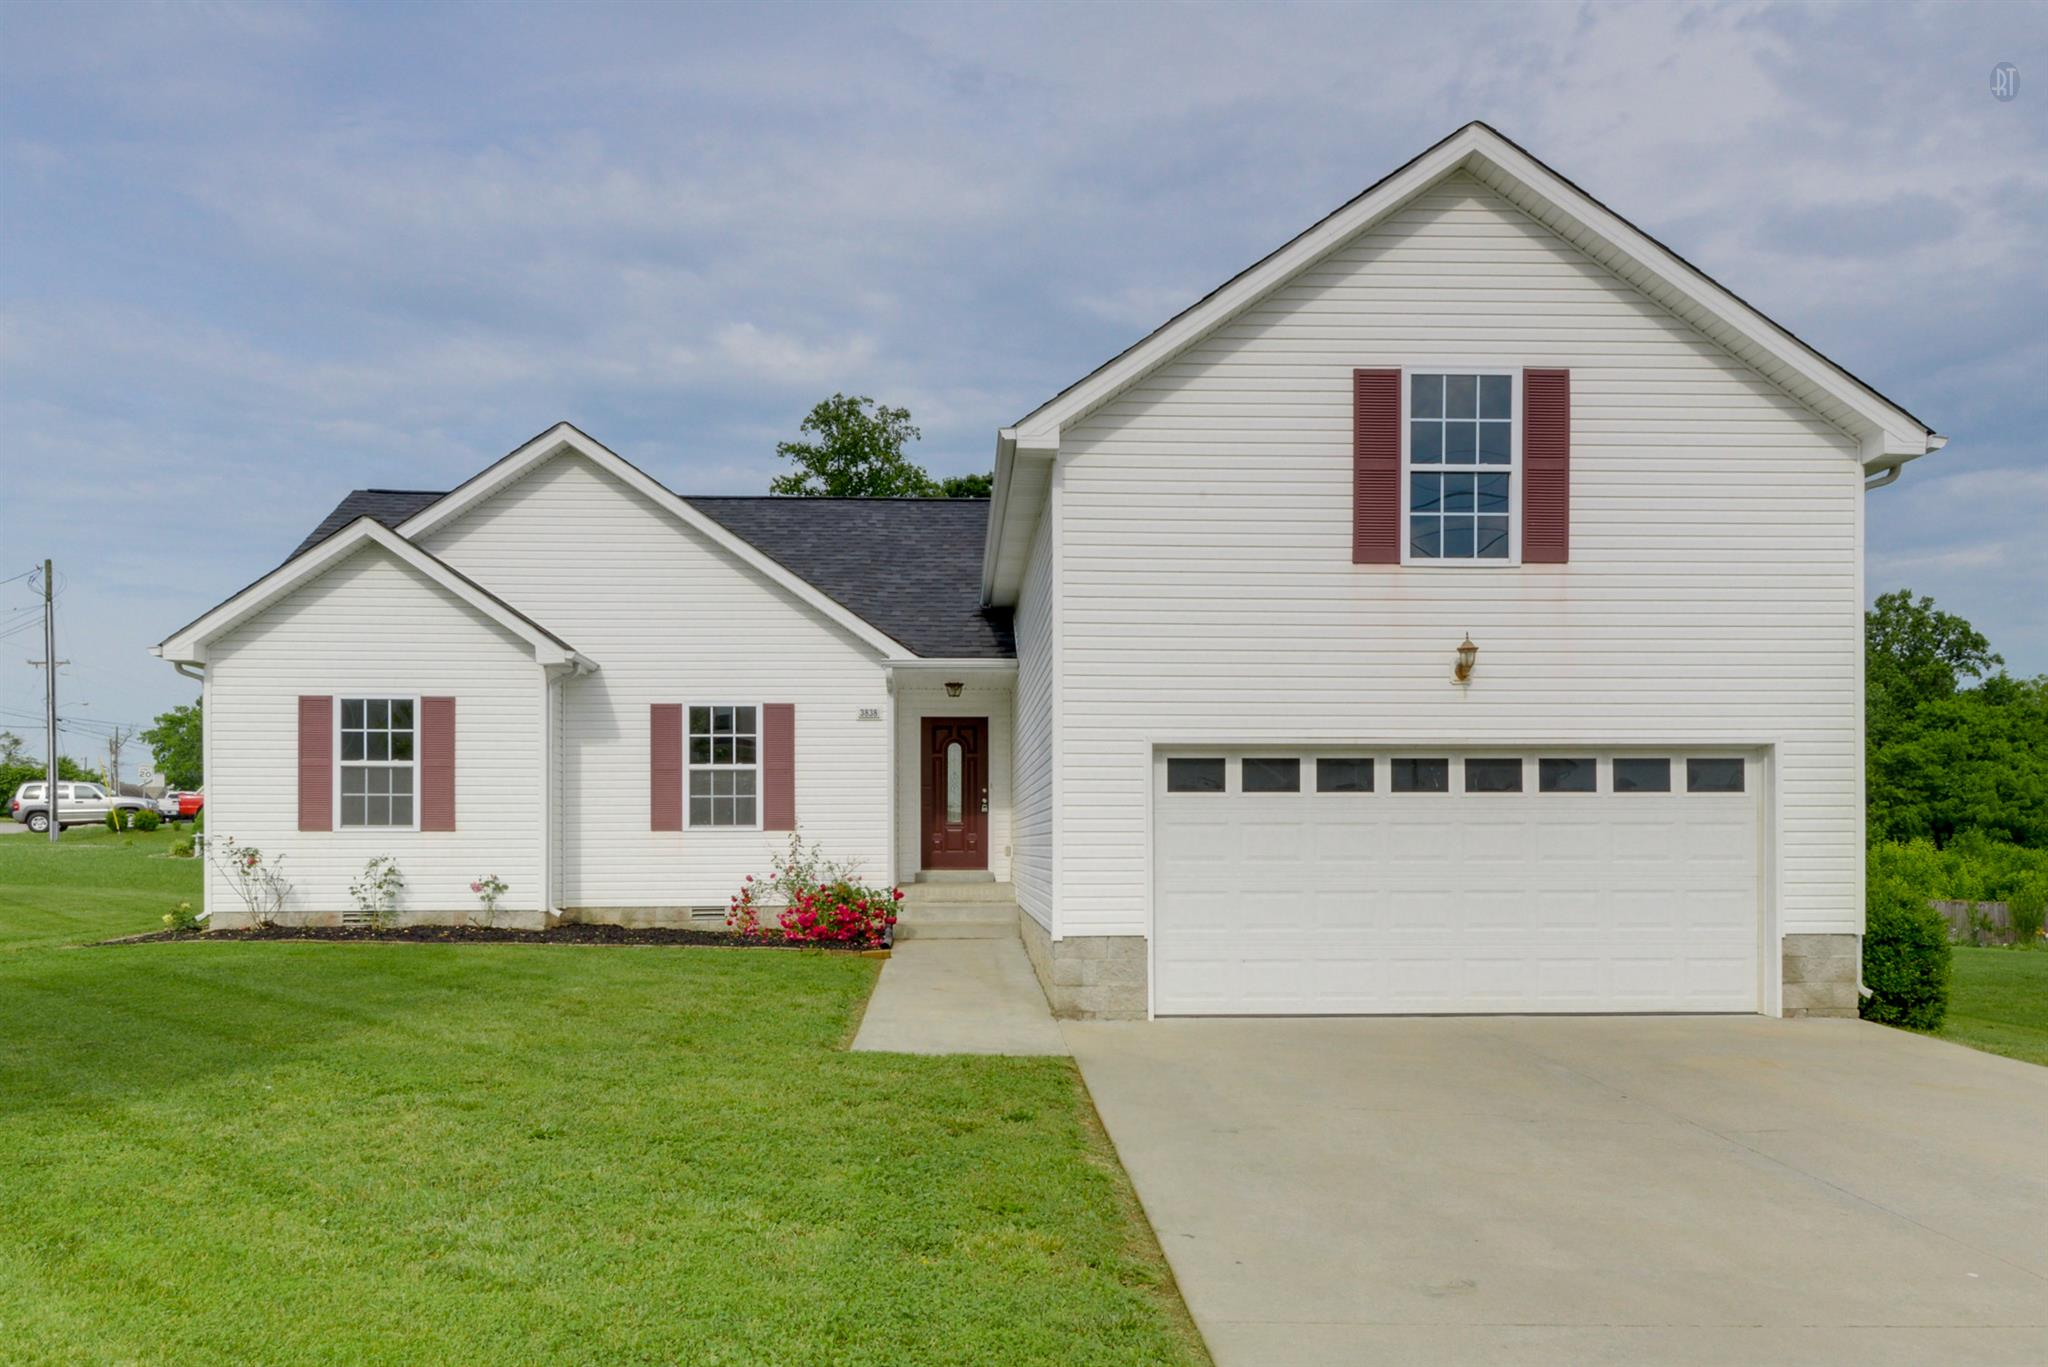 3838 Cannondale Dr, Clarksville, TN 37042